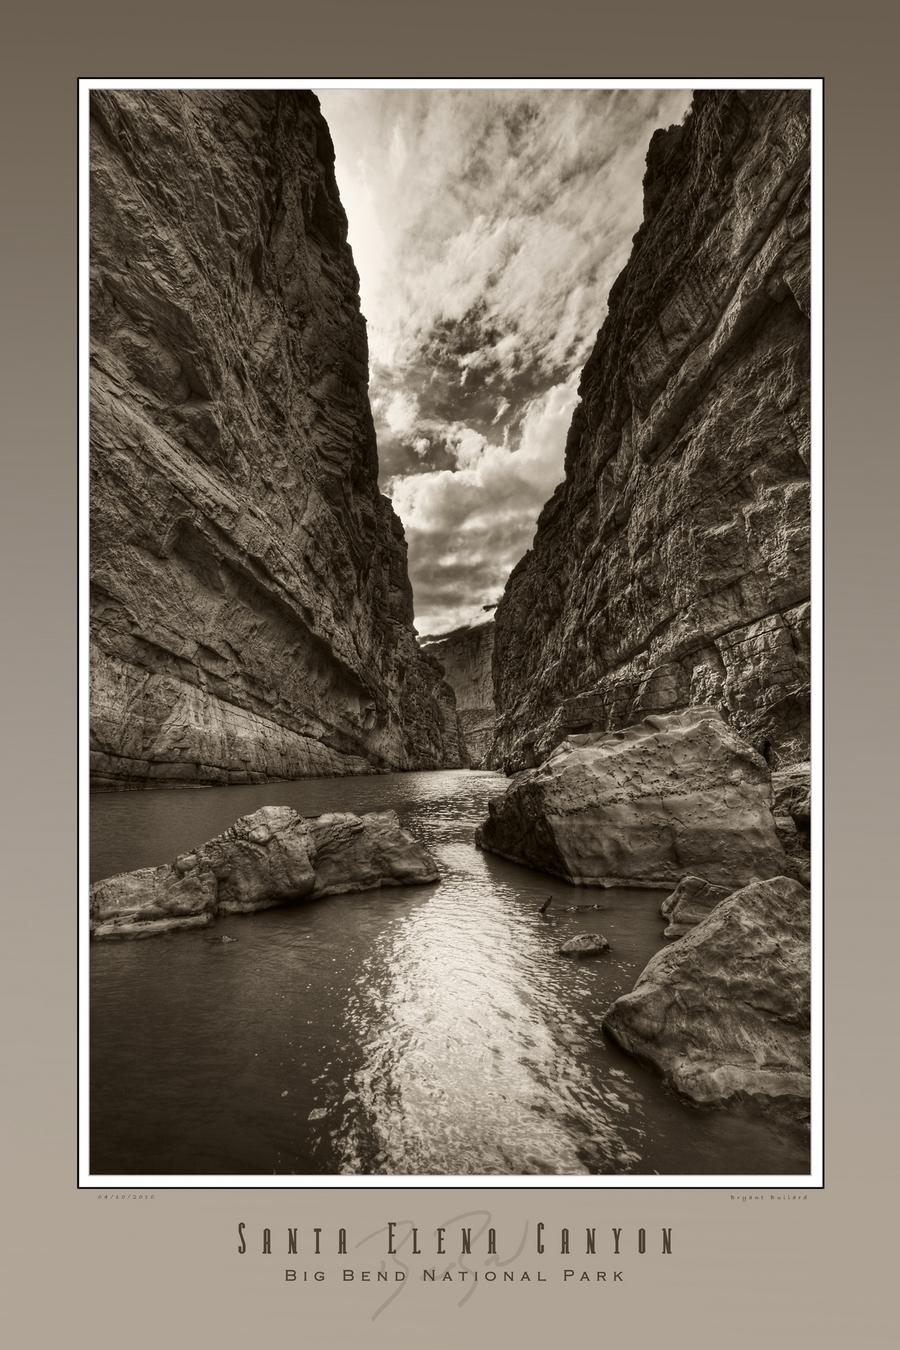 St elena canyon 24 x 36